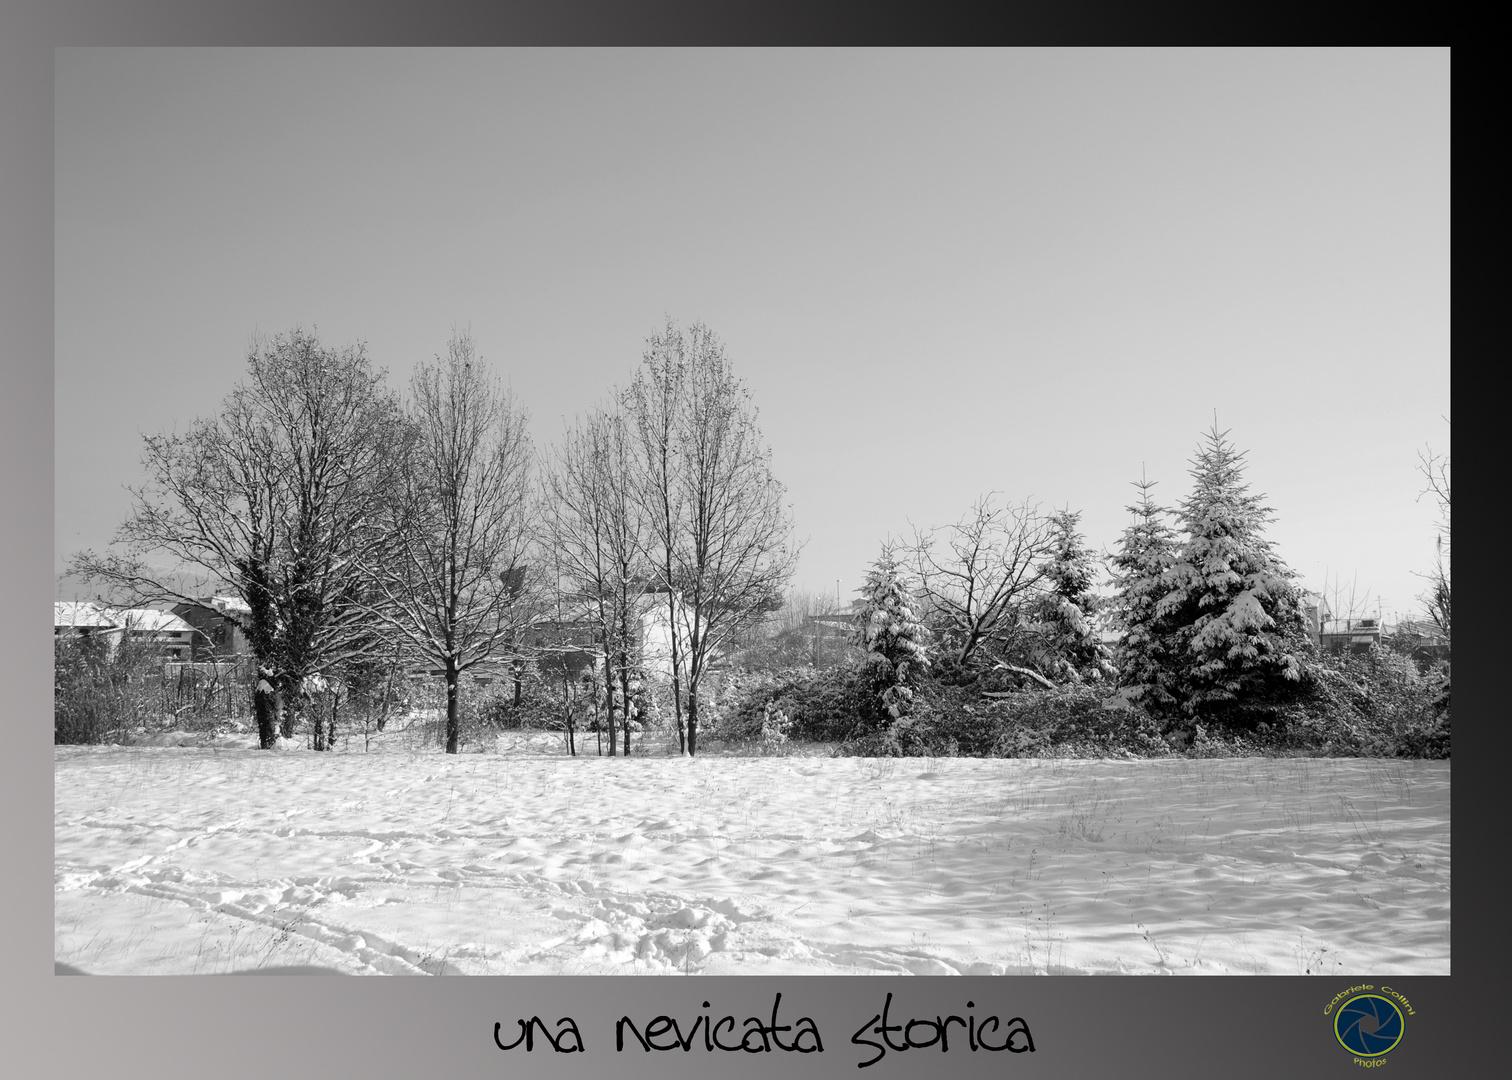 una nevicata storica